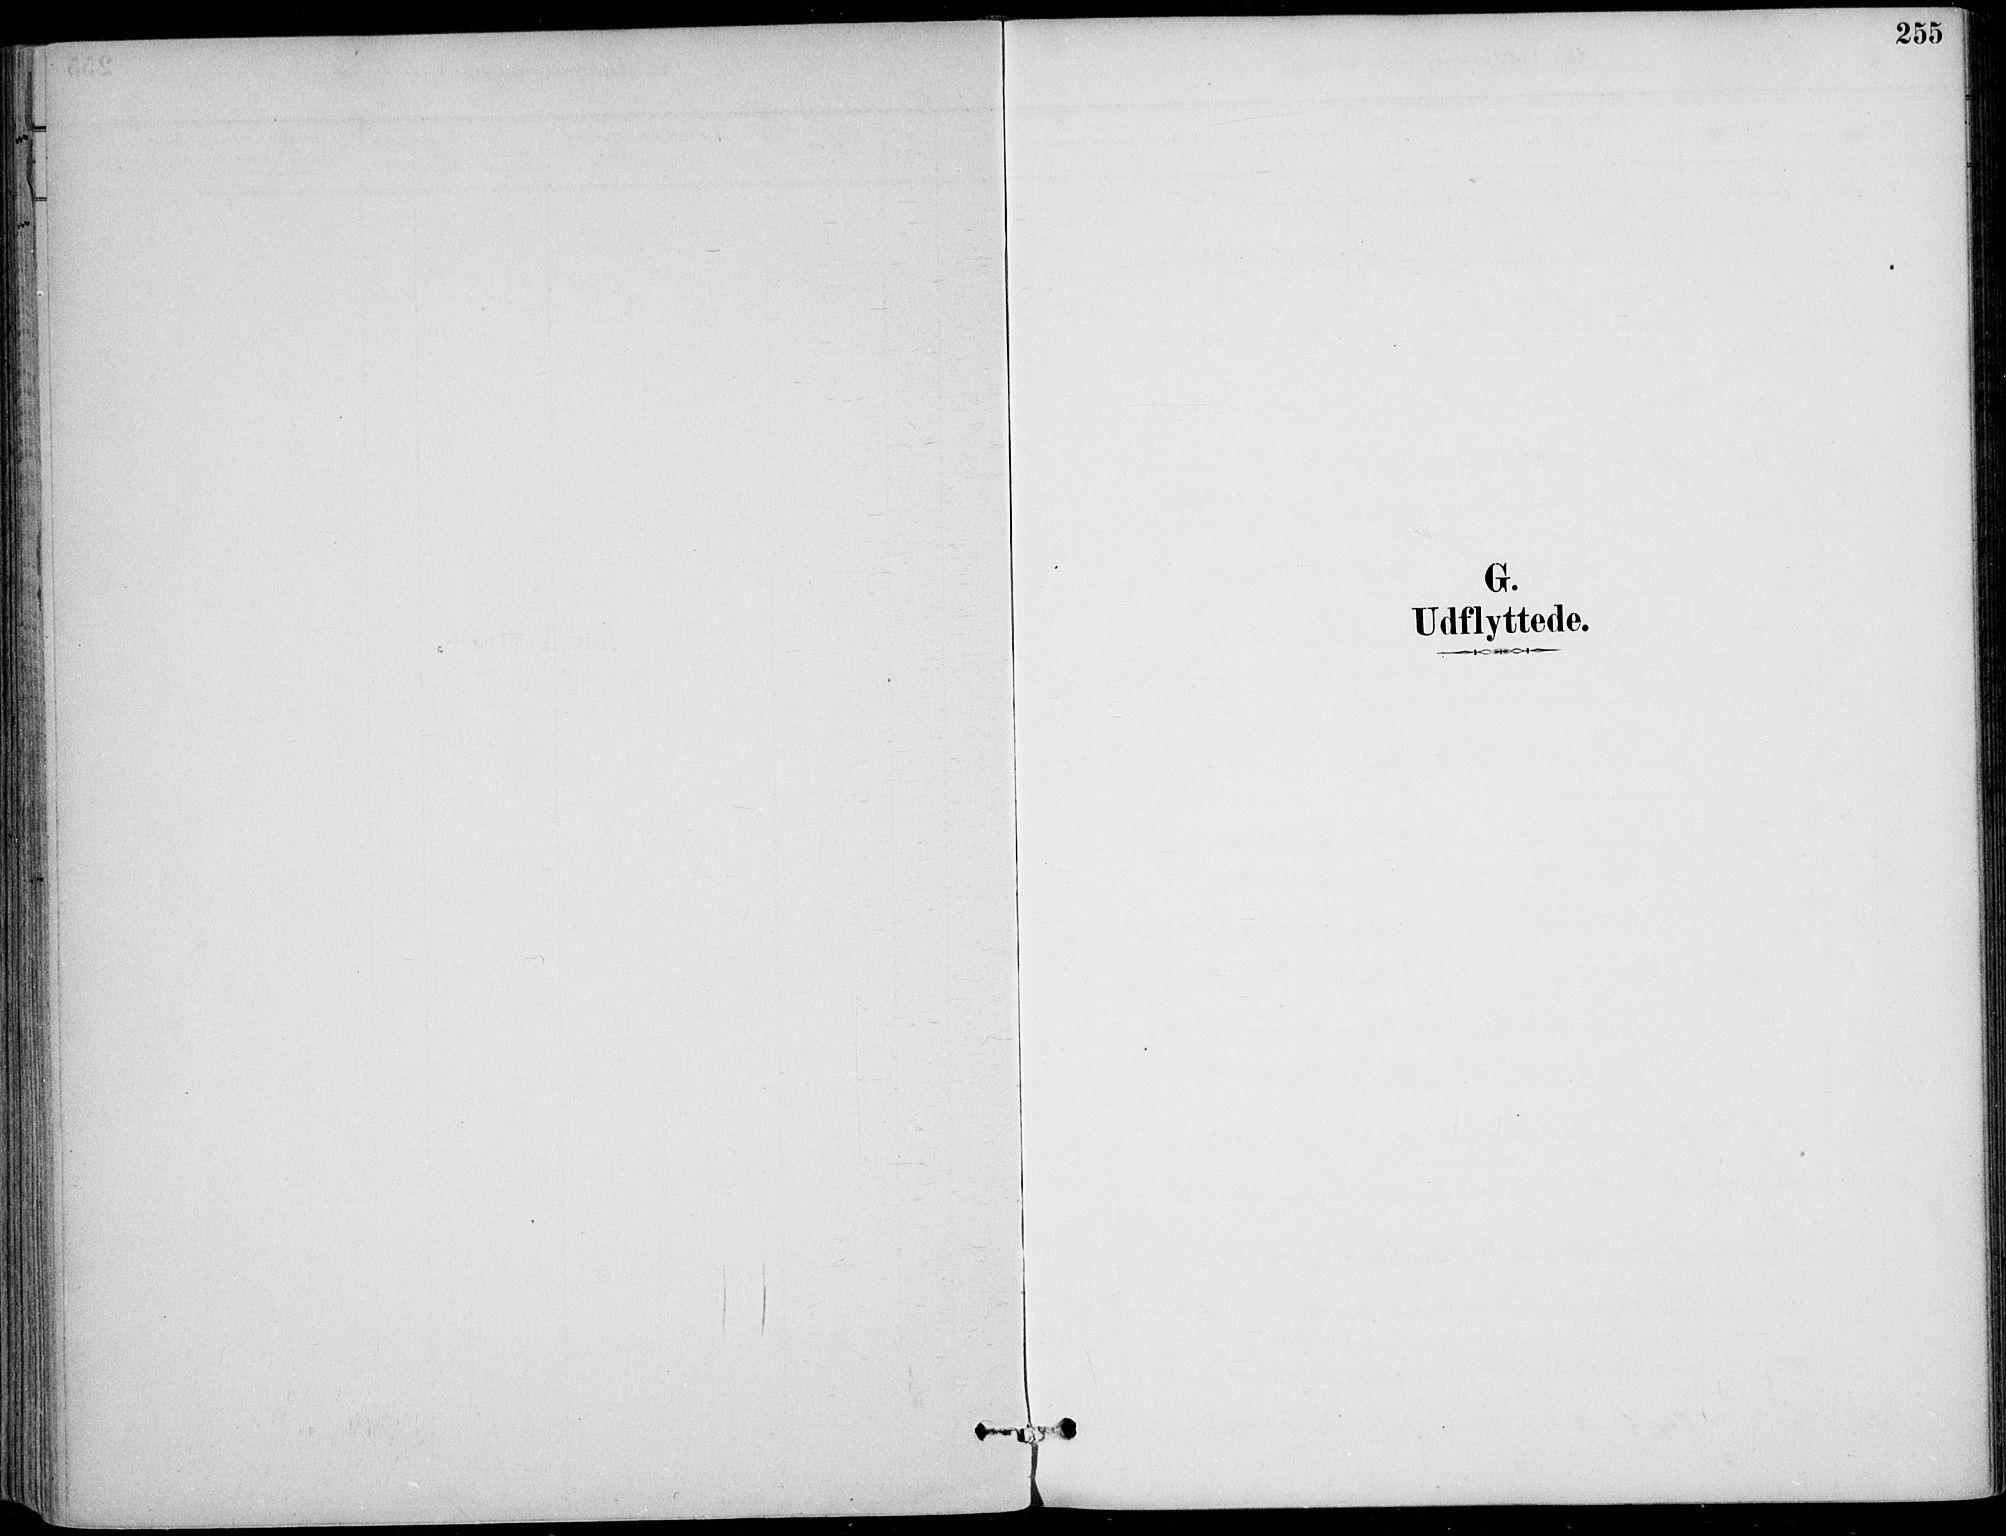 SAKO, Sigdal kirkebøker, F/Fb/L0001: Ministerialbok nr. II 1, 1888-1900, s. 255